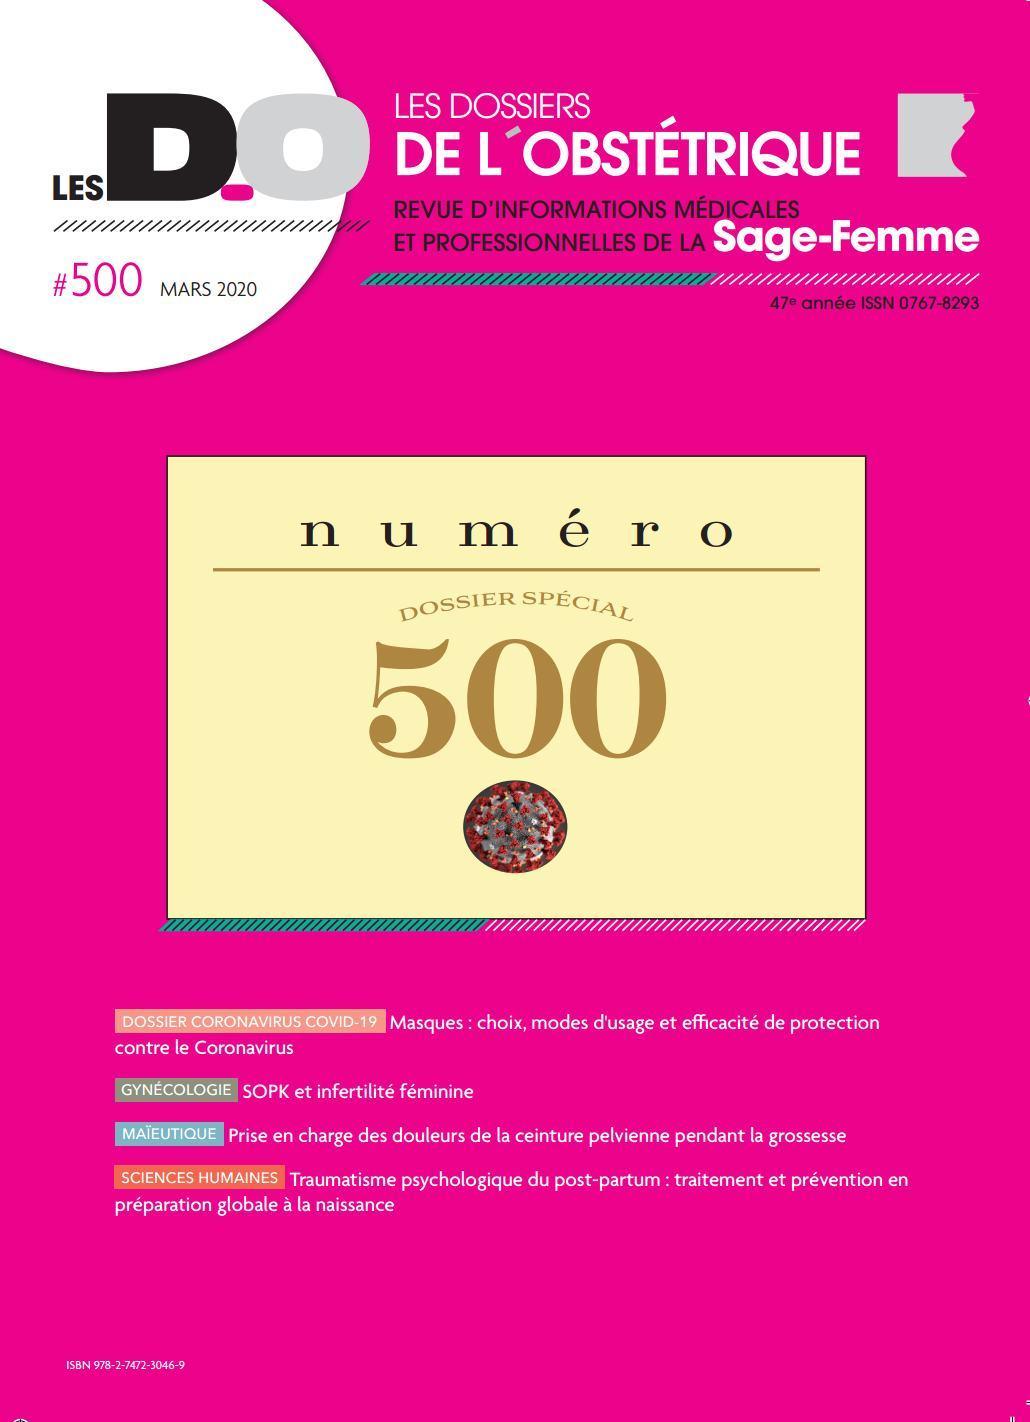 DOSSIER SPECIAL : CORONAVIRUS COVID-19. N 500 03/20 - LES DOSSIERS DE L'OBSTETRIQUE 500 MARS 2020